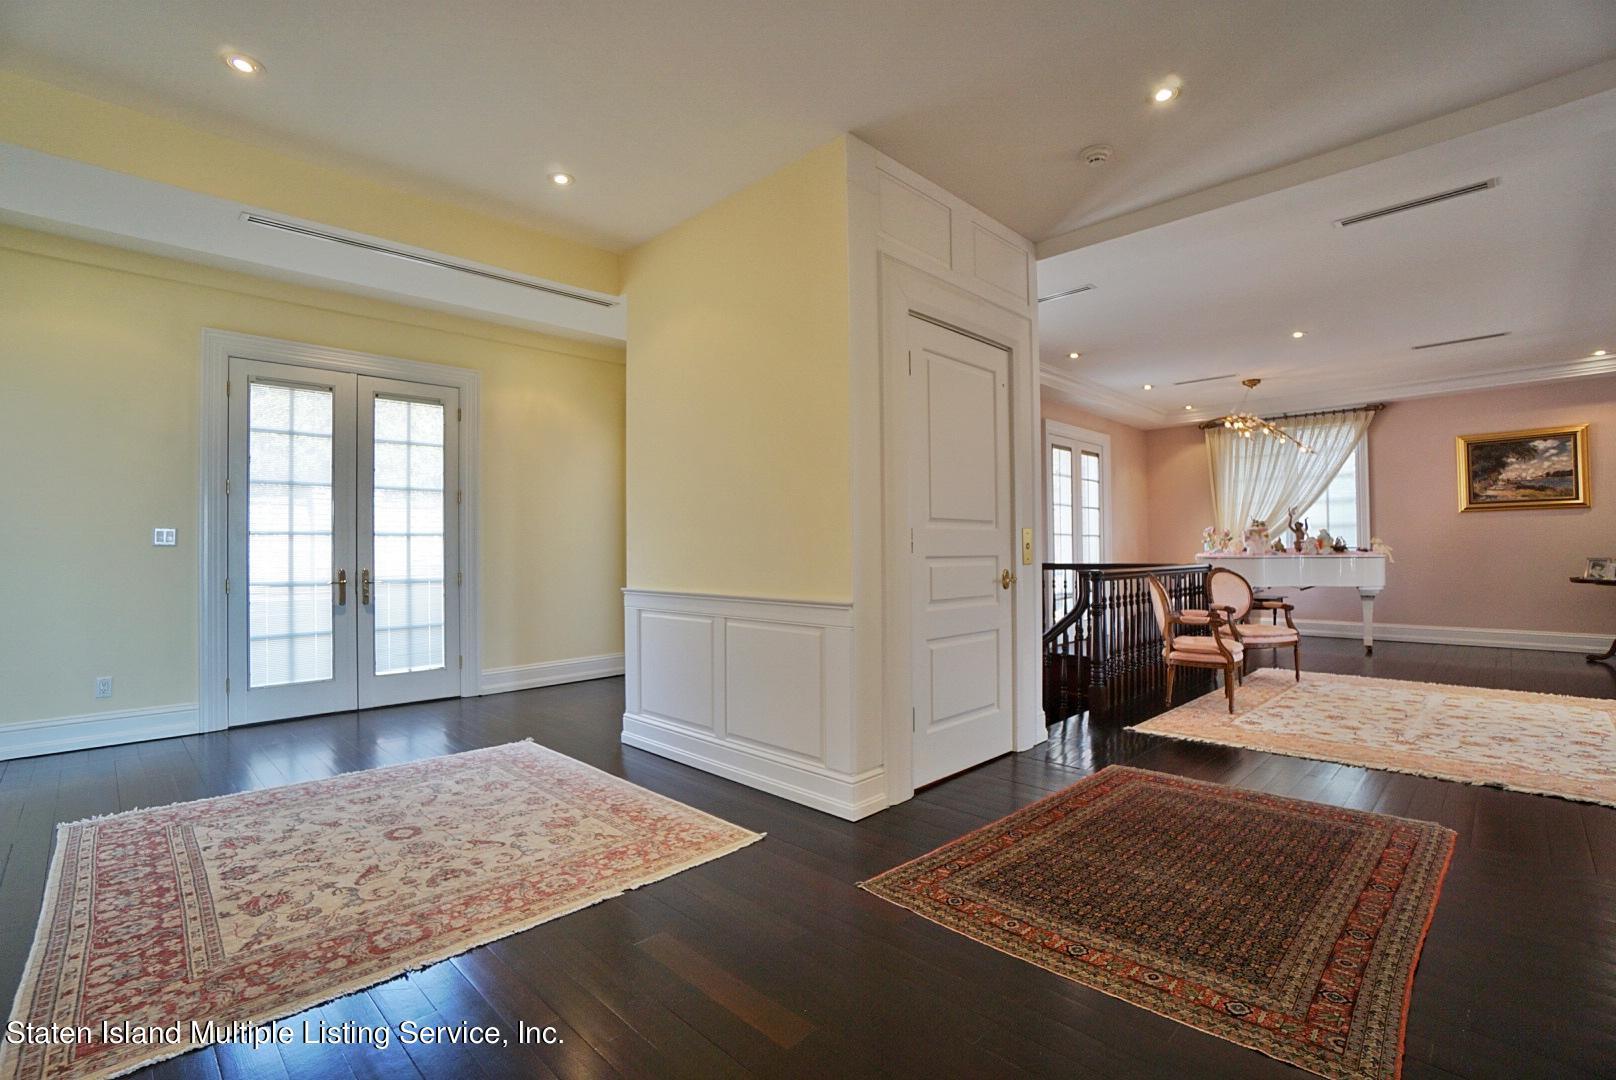 Single Family - Detached 129 Coverly Avenue   Staten Island, NY 10301, MLS-1144490-14